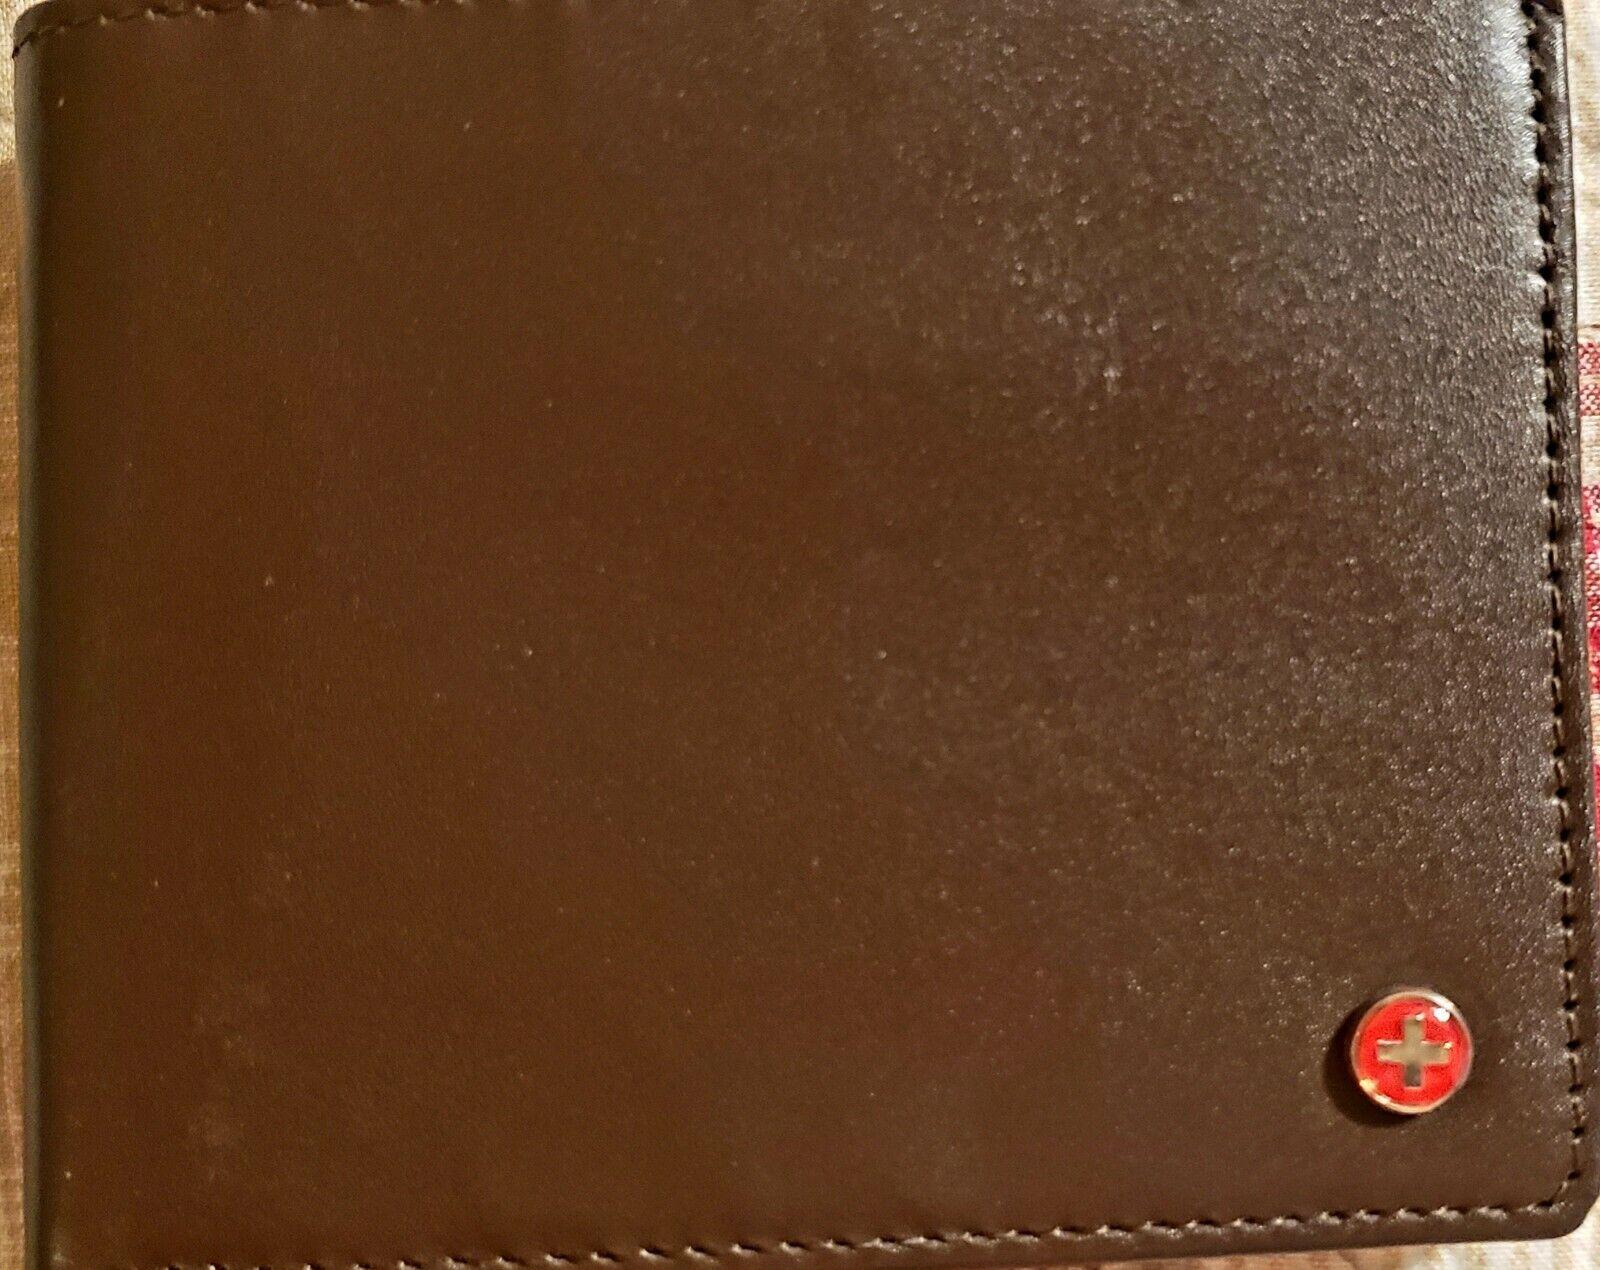 Alpine Swiss Light Brown Mens Wallet Leather Brand New No Box.